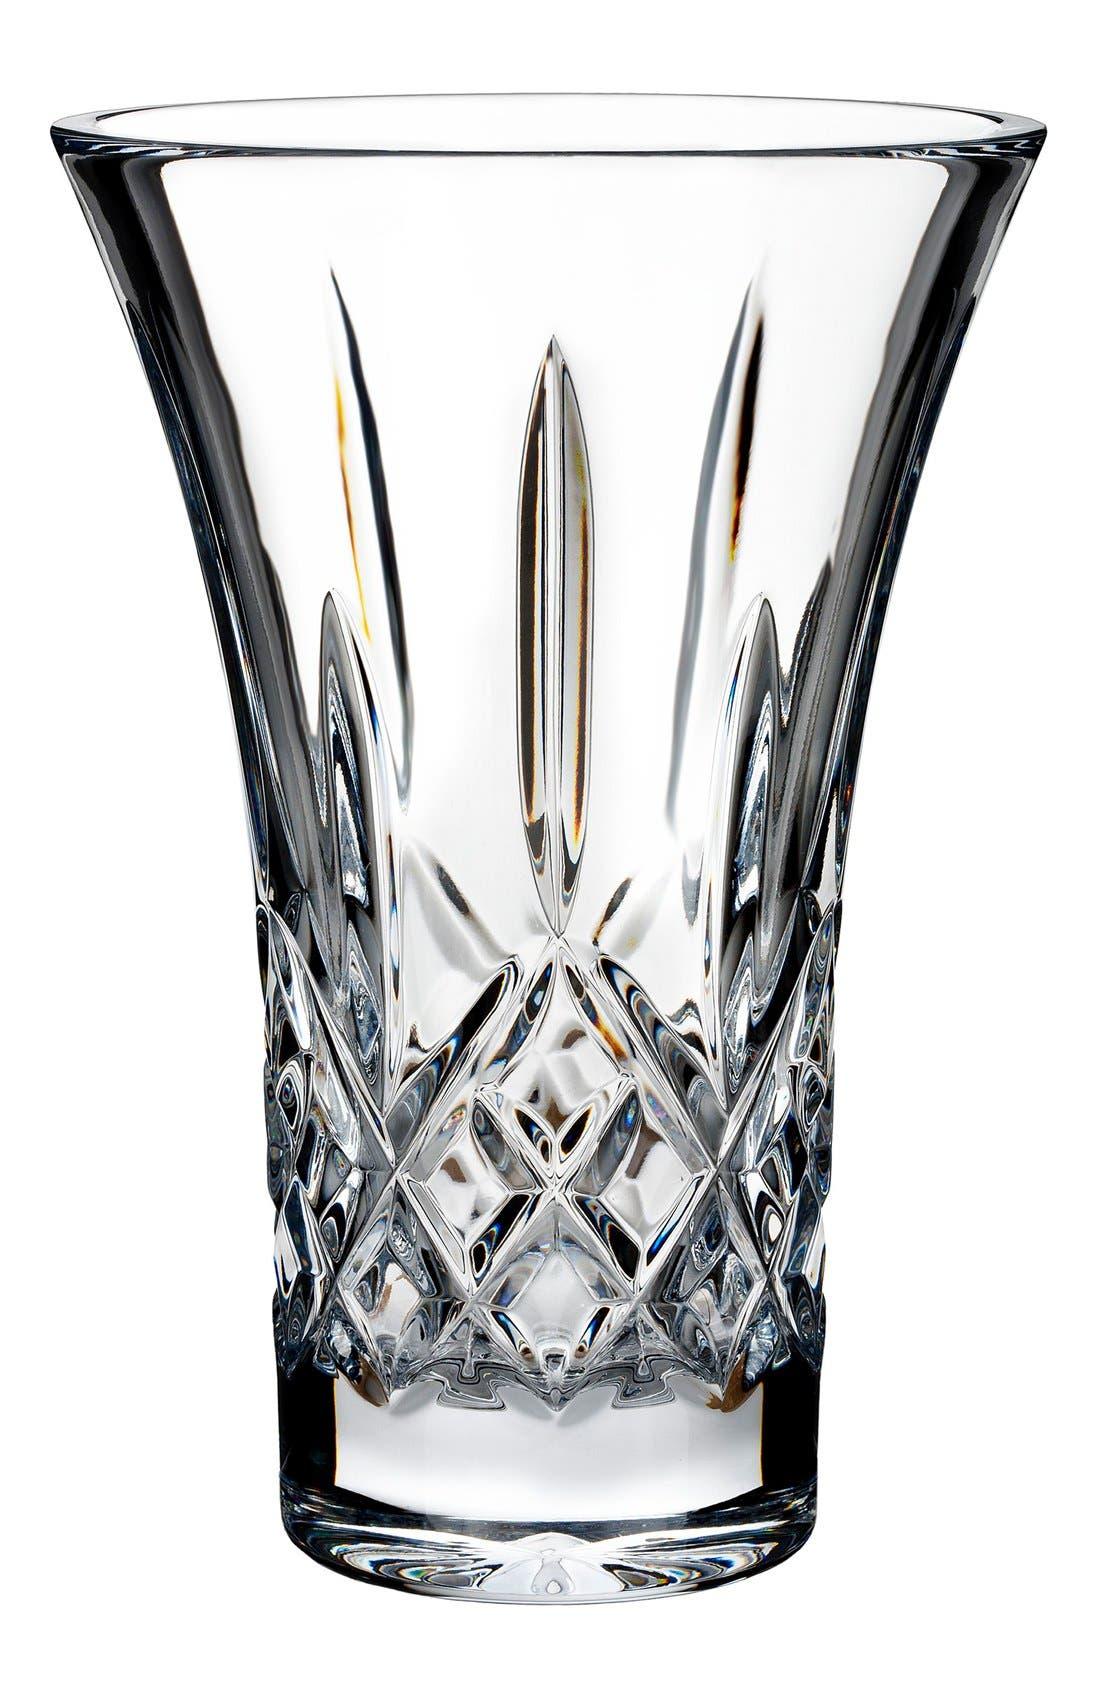 Alternate Image 1 Selected - Waterford 'Lismore' Lead Crystal Flared Vase